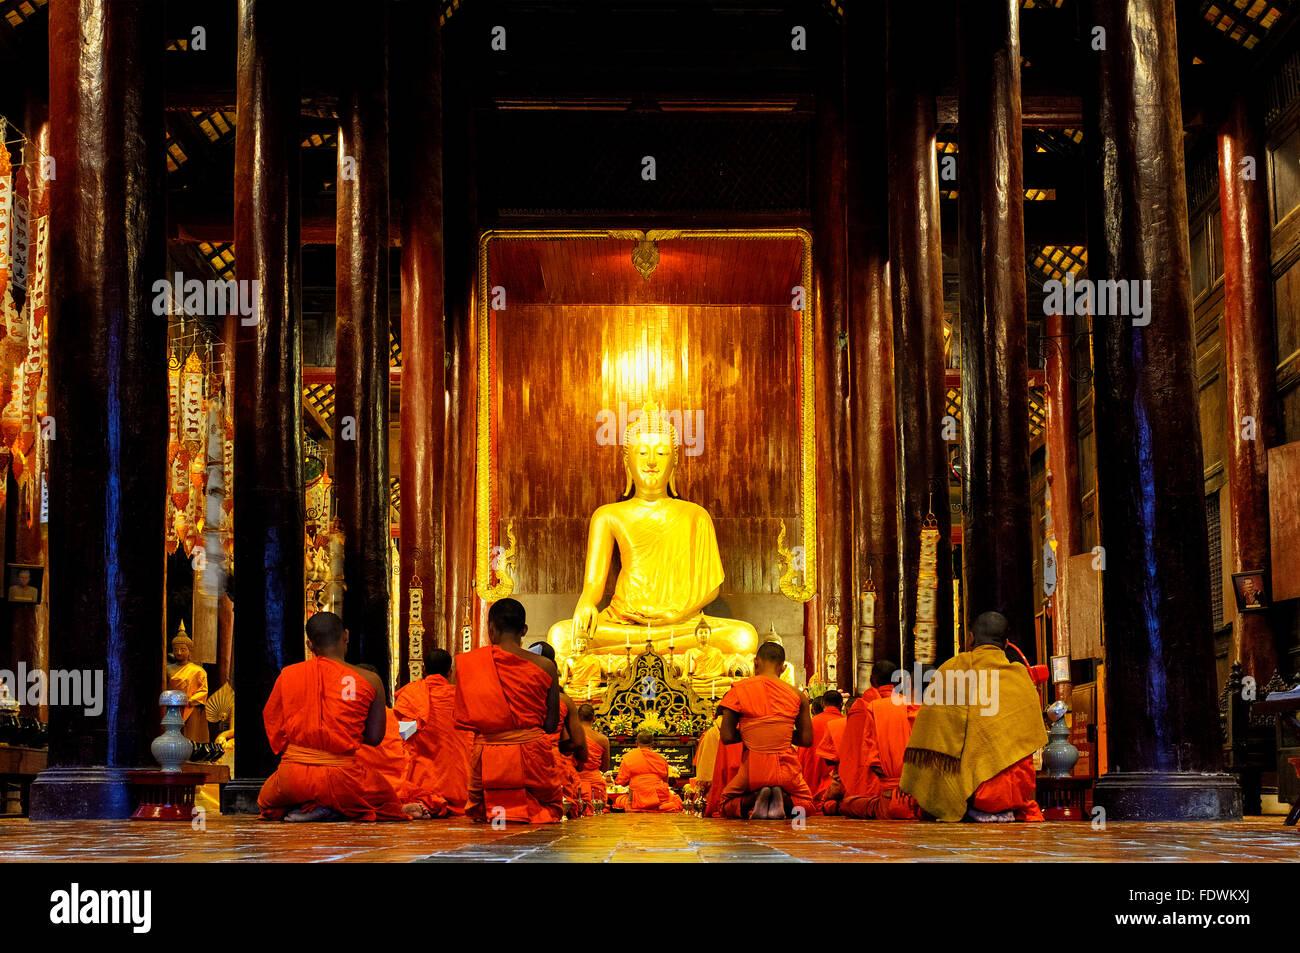 Moines priant dans Wat Phan Tao, Chiang Mai, Thaïlande Photo Stock